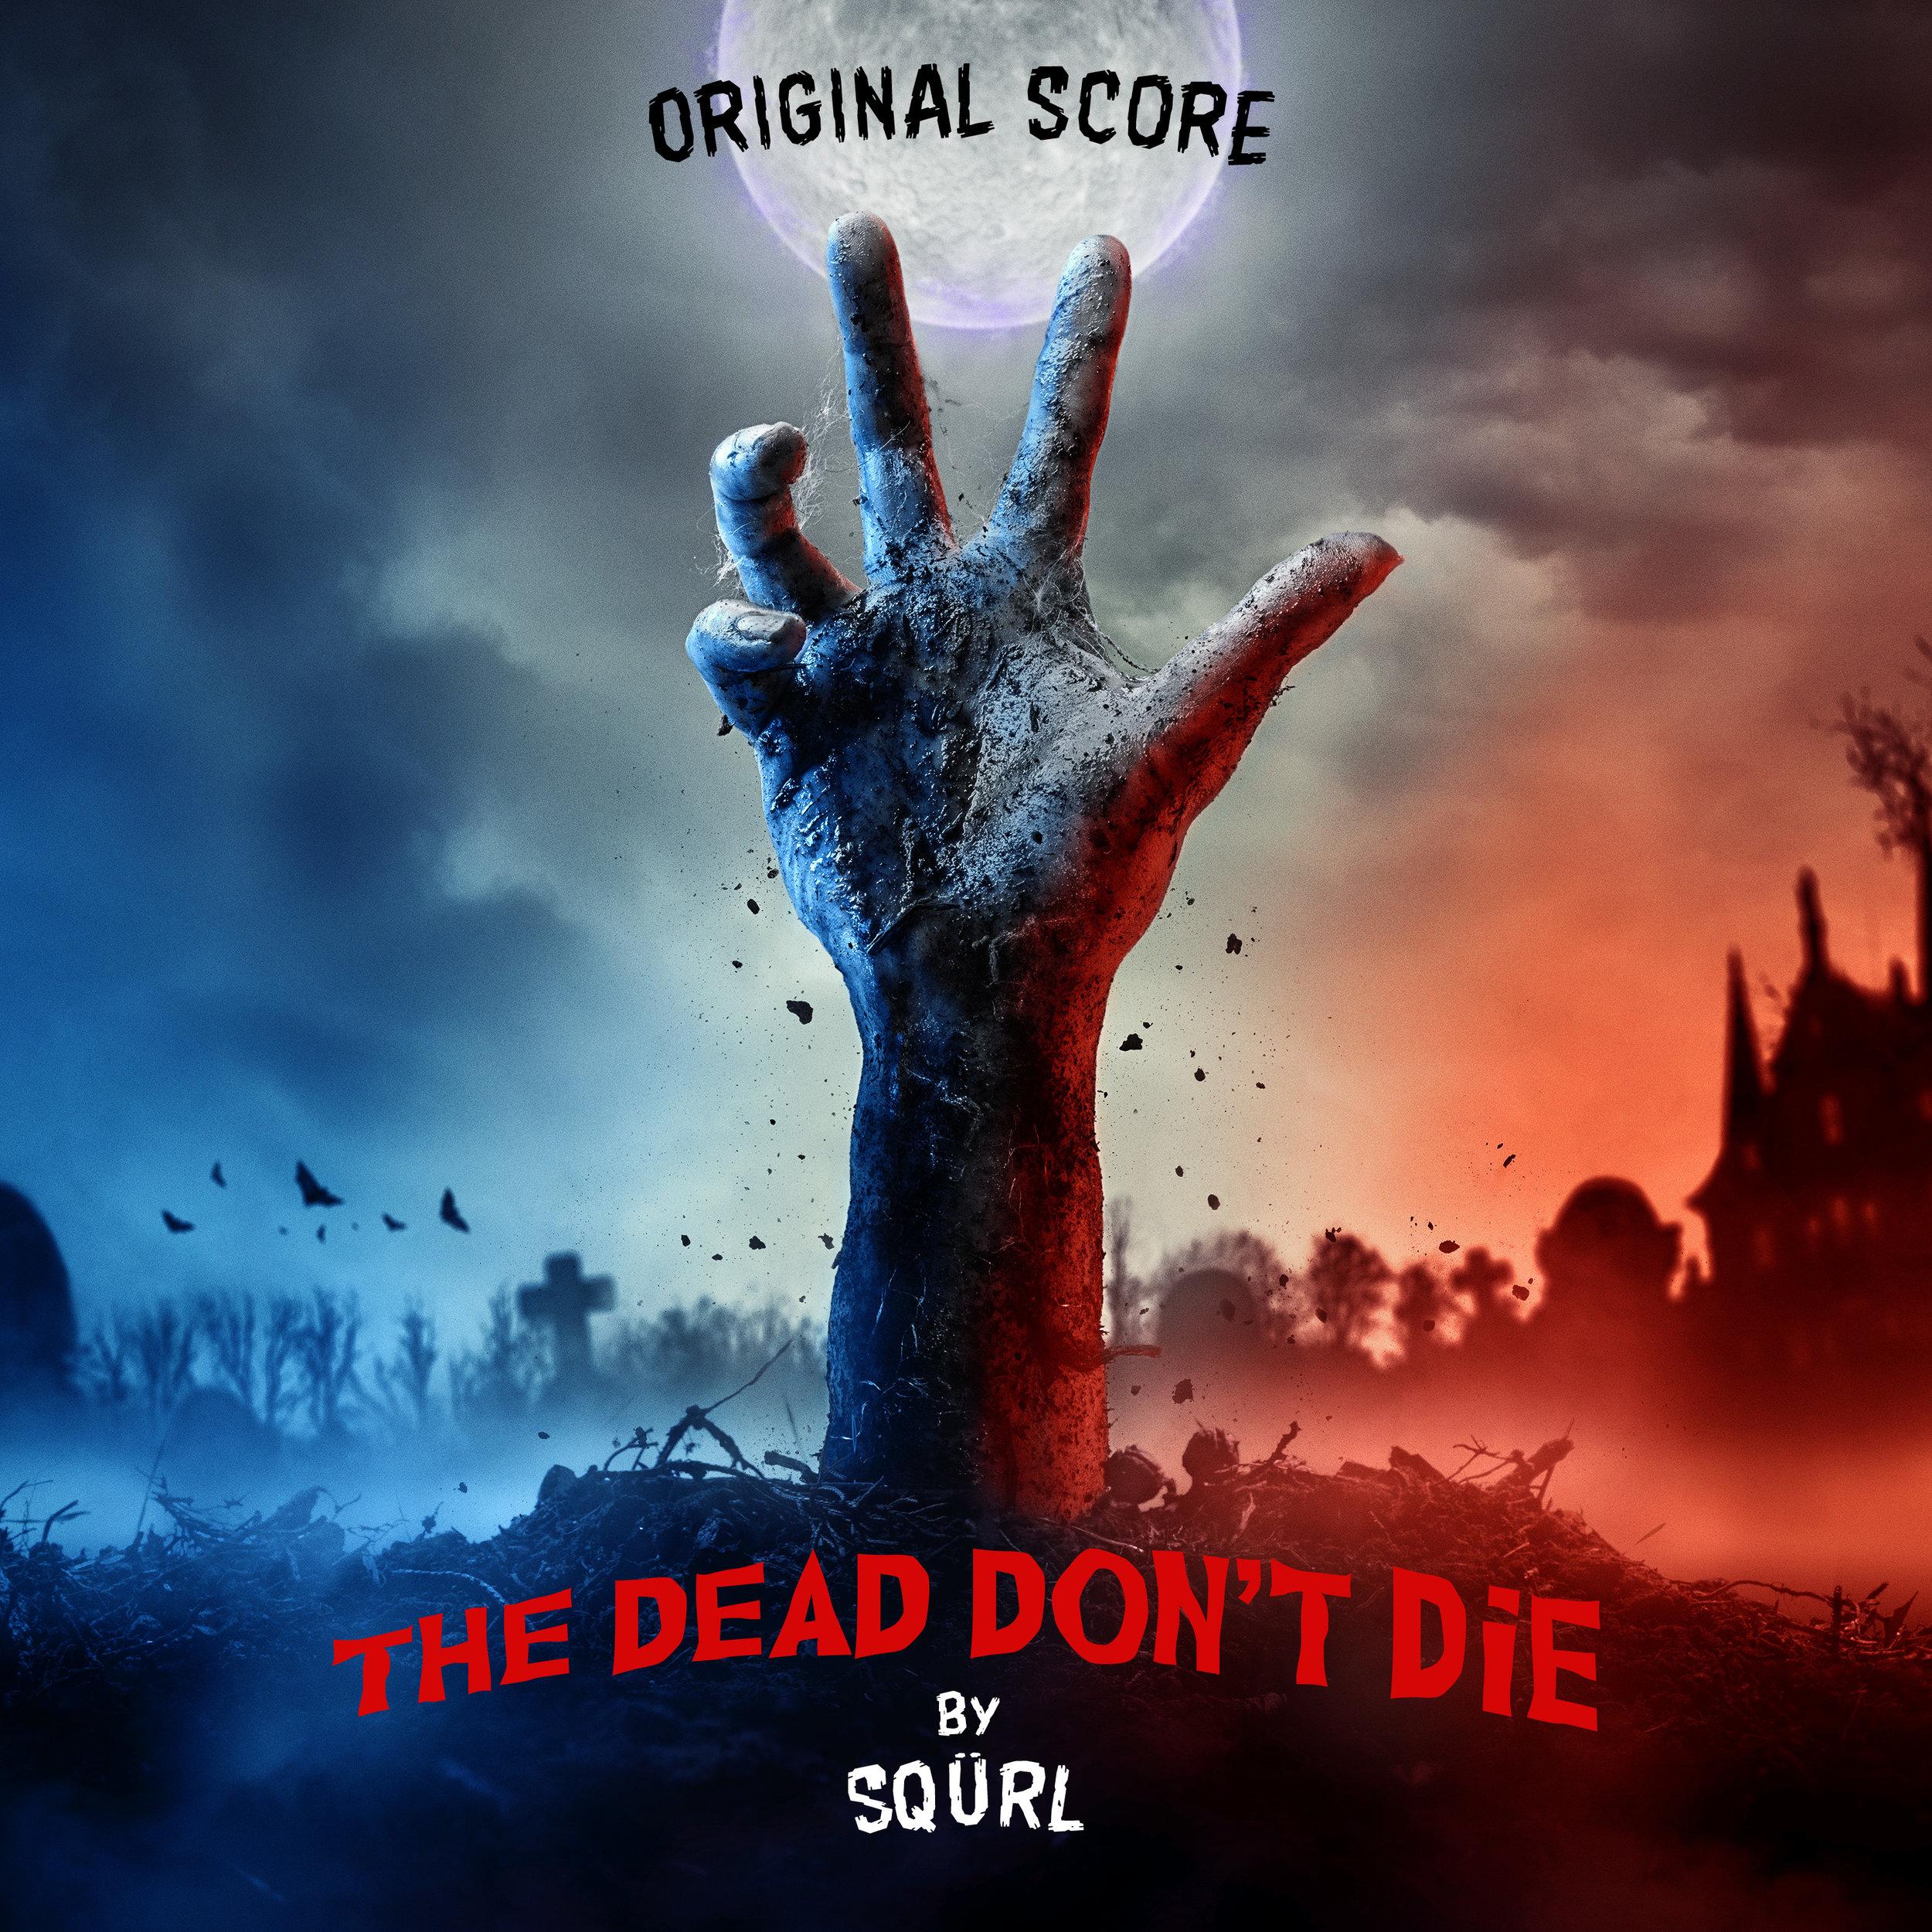 SQÜRL - The Dead Don't Die (Original Score)  Devices Used:  Dispatch Master  /  Transmisser  /  Spires  /  Aqueduct  /  Rainbow Machine  /  Space Spiral